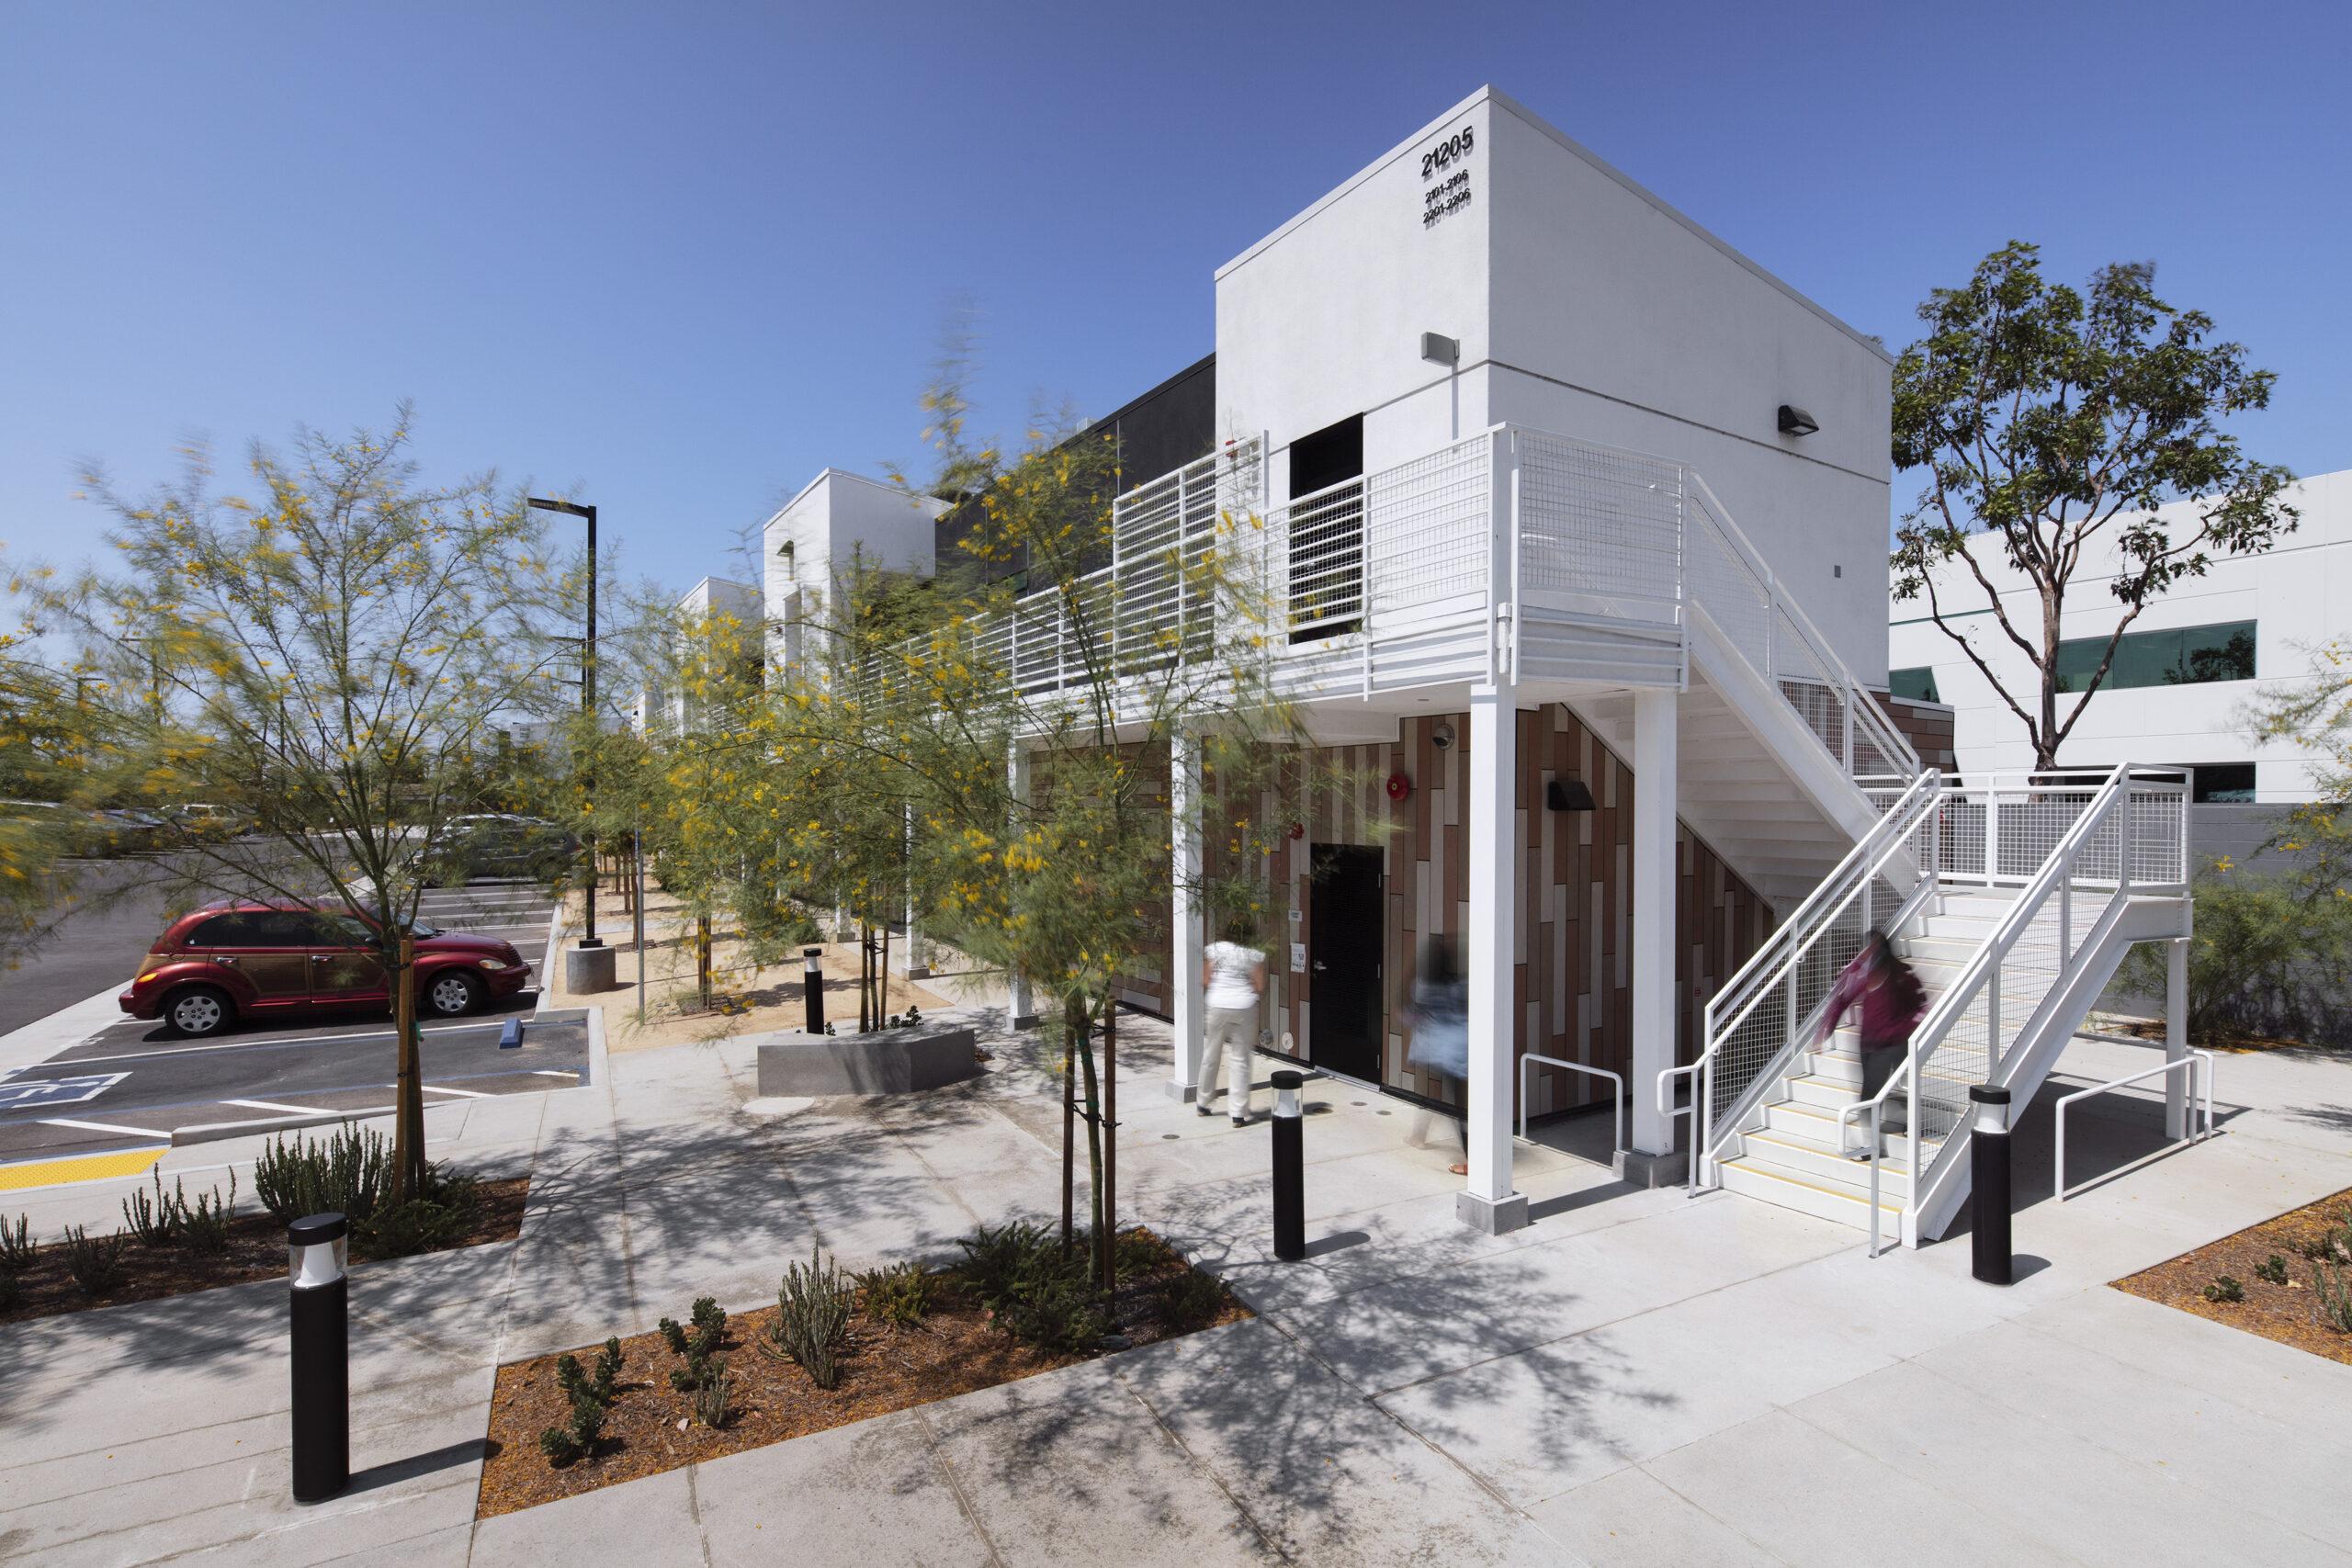 Carson arts apartment exterior view6